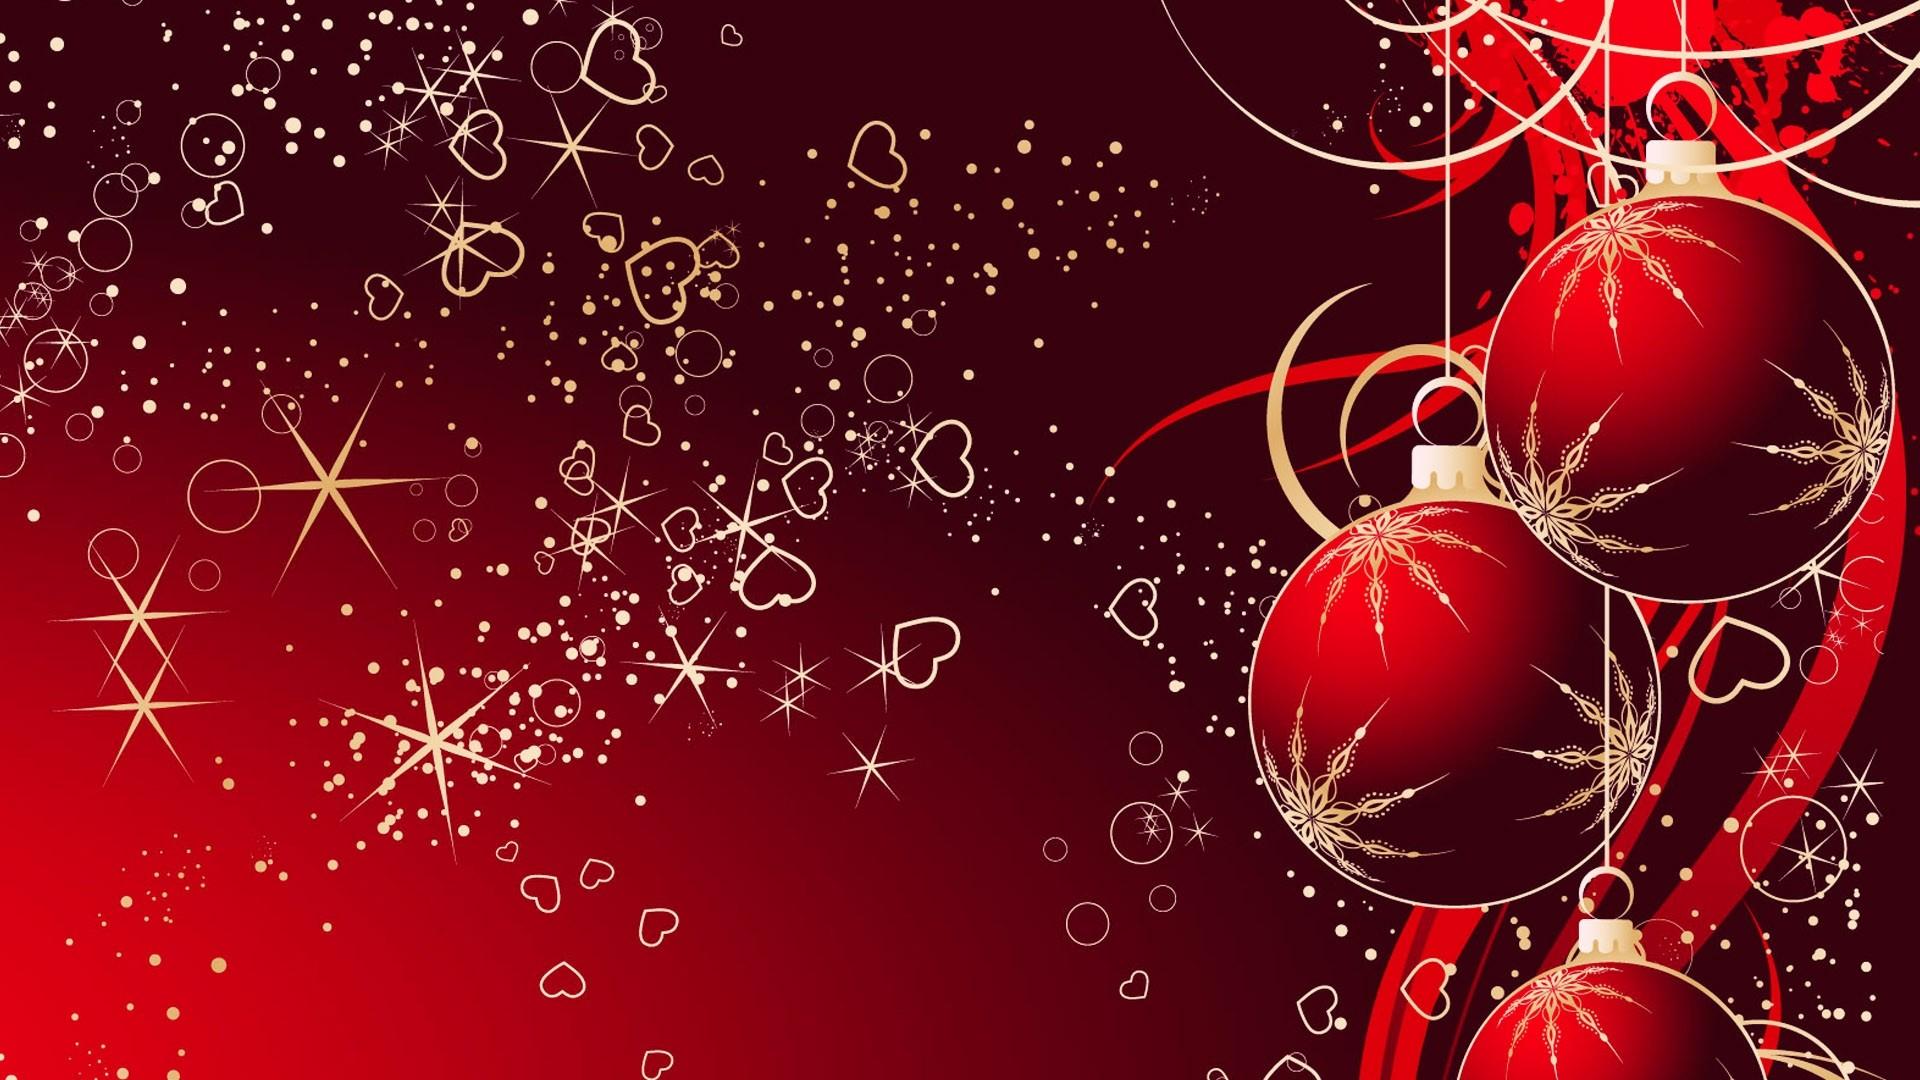 Christmas Hd Wallpapers 1080p.Christmas Wallpapers Backgrounds Wallpapertag